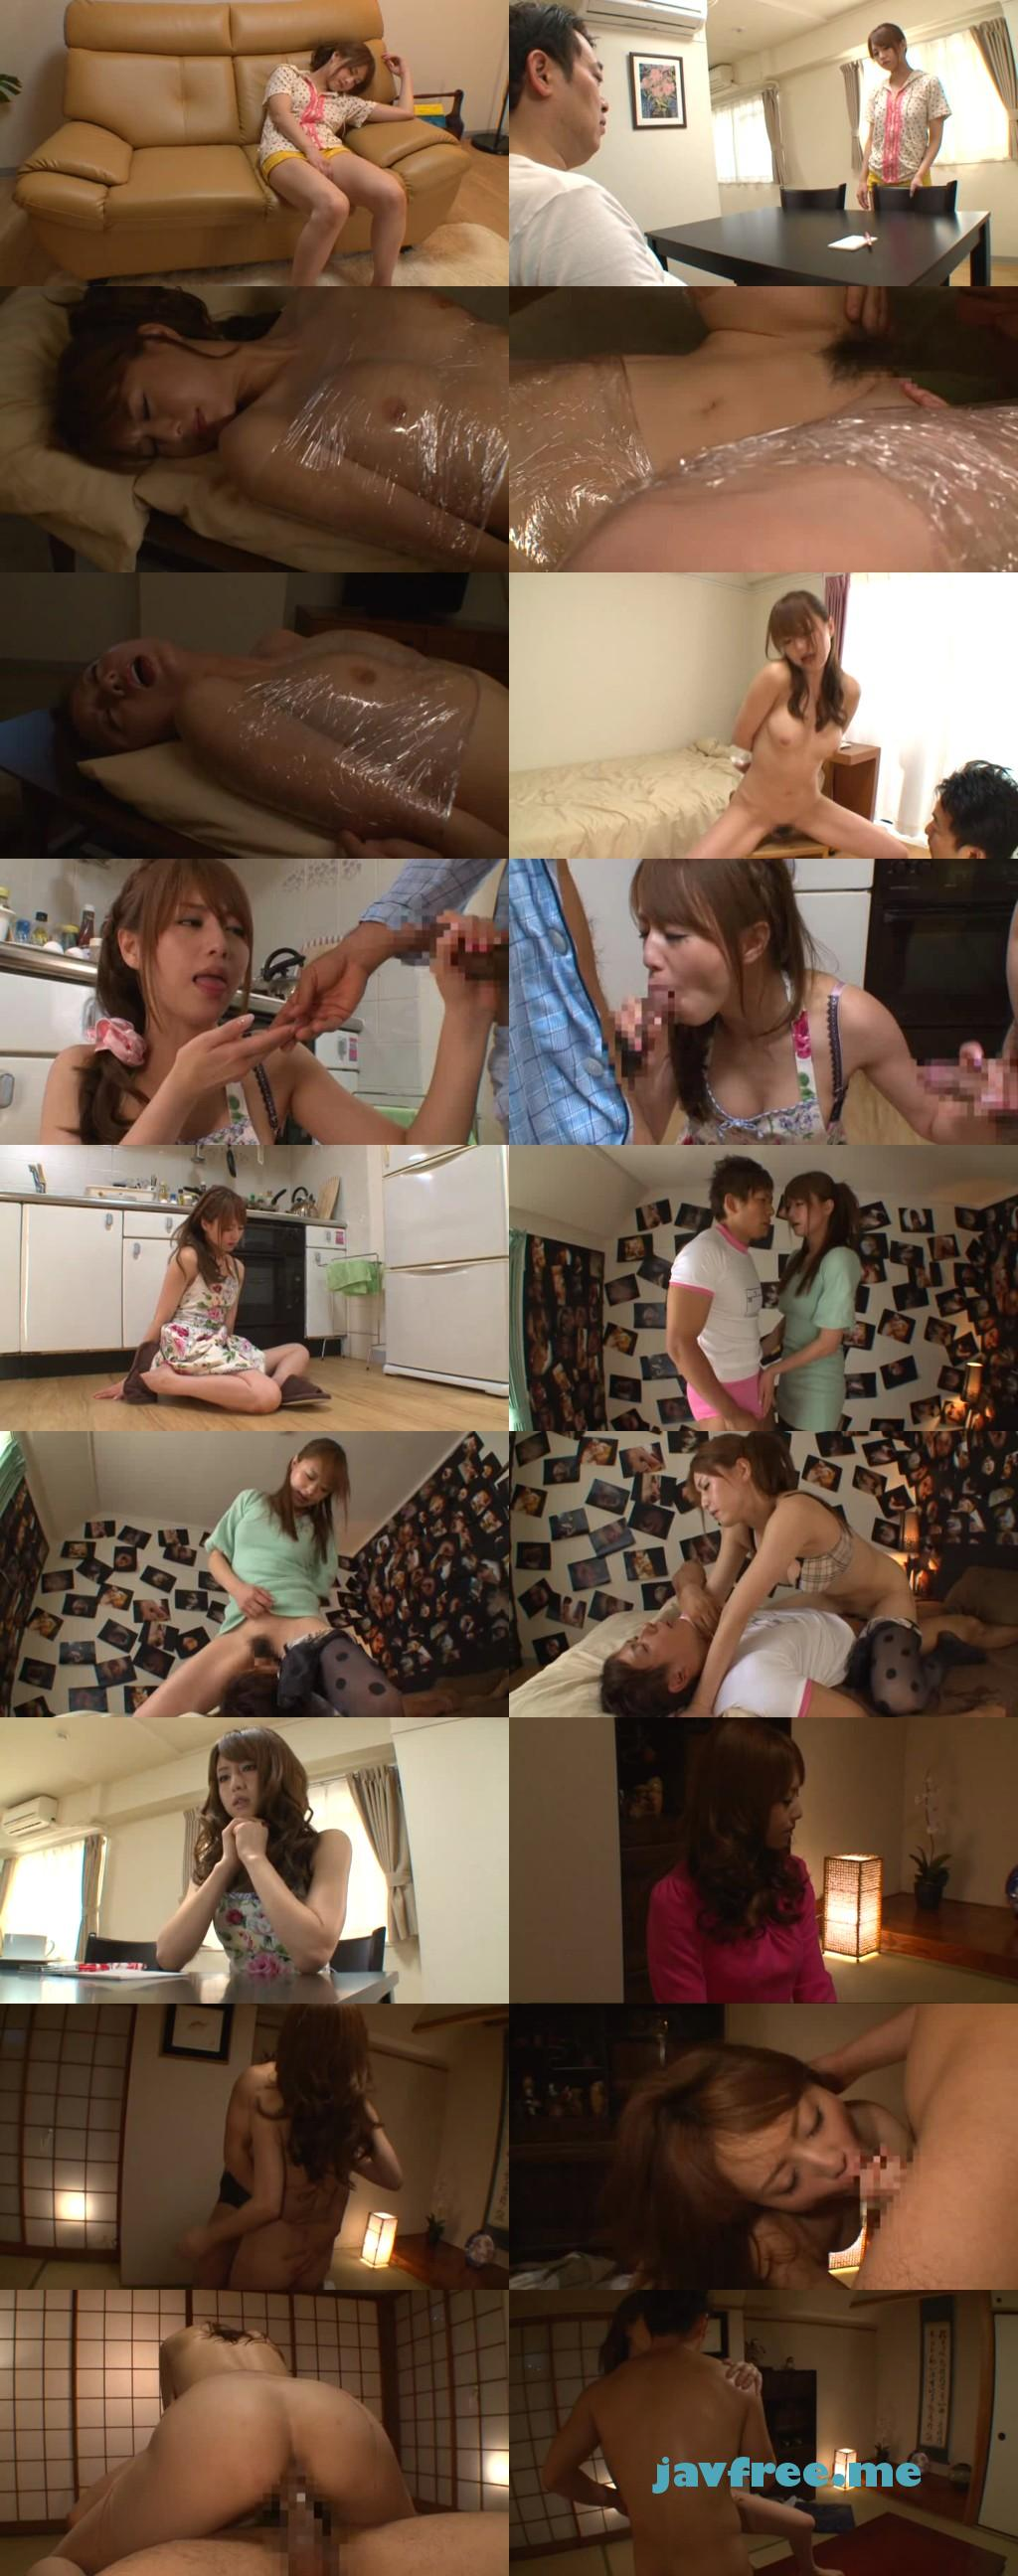 [DVD][MXGS 446] 犯され養女、明歩。 吉沢明歩 吉沢明歩 MXGS